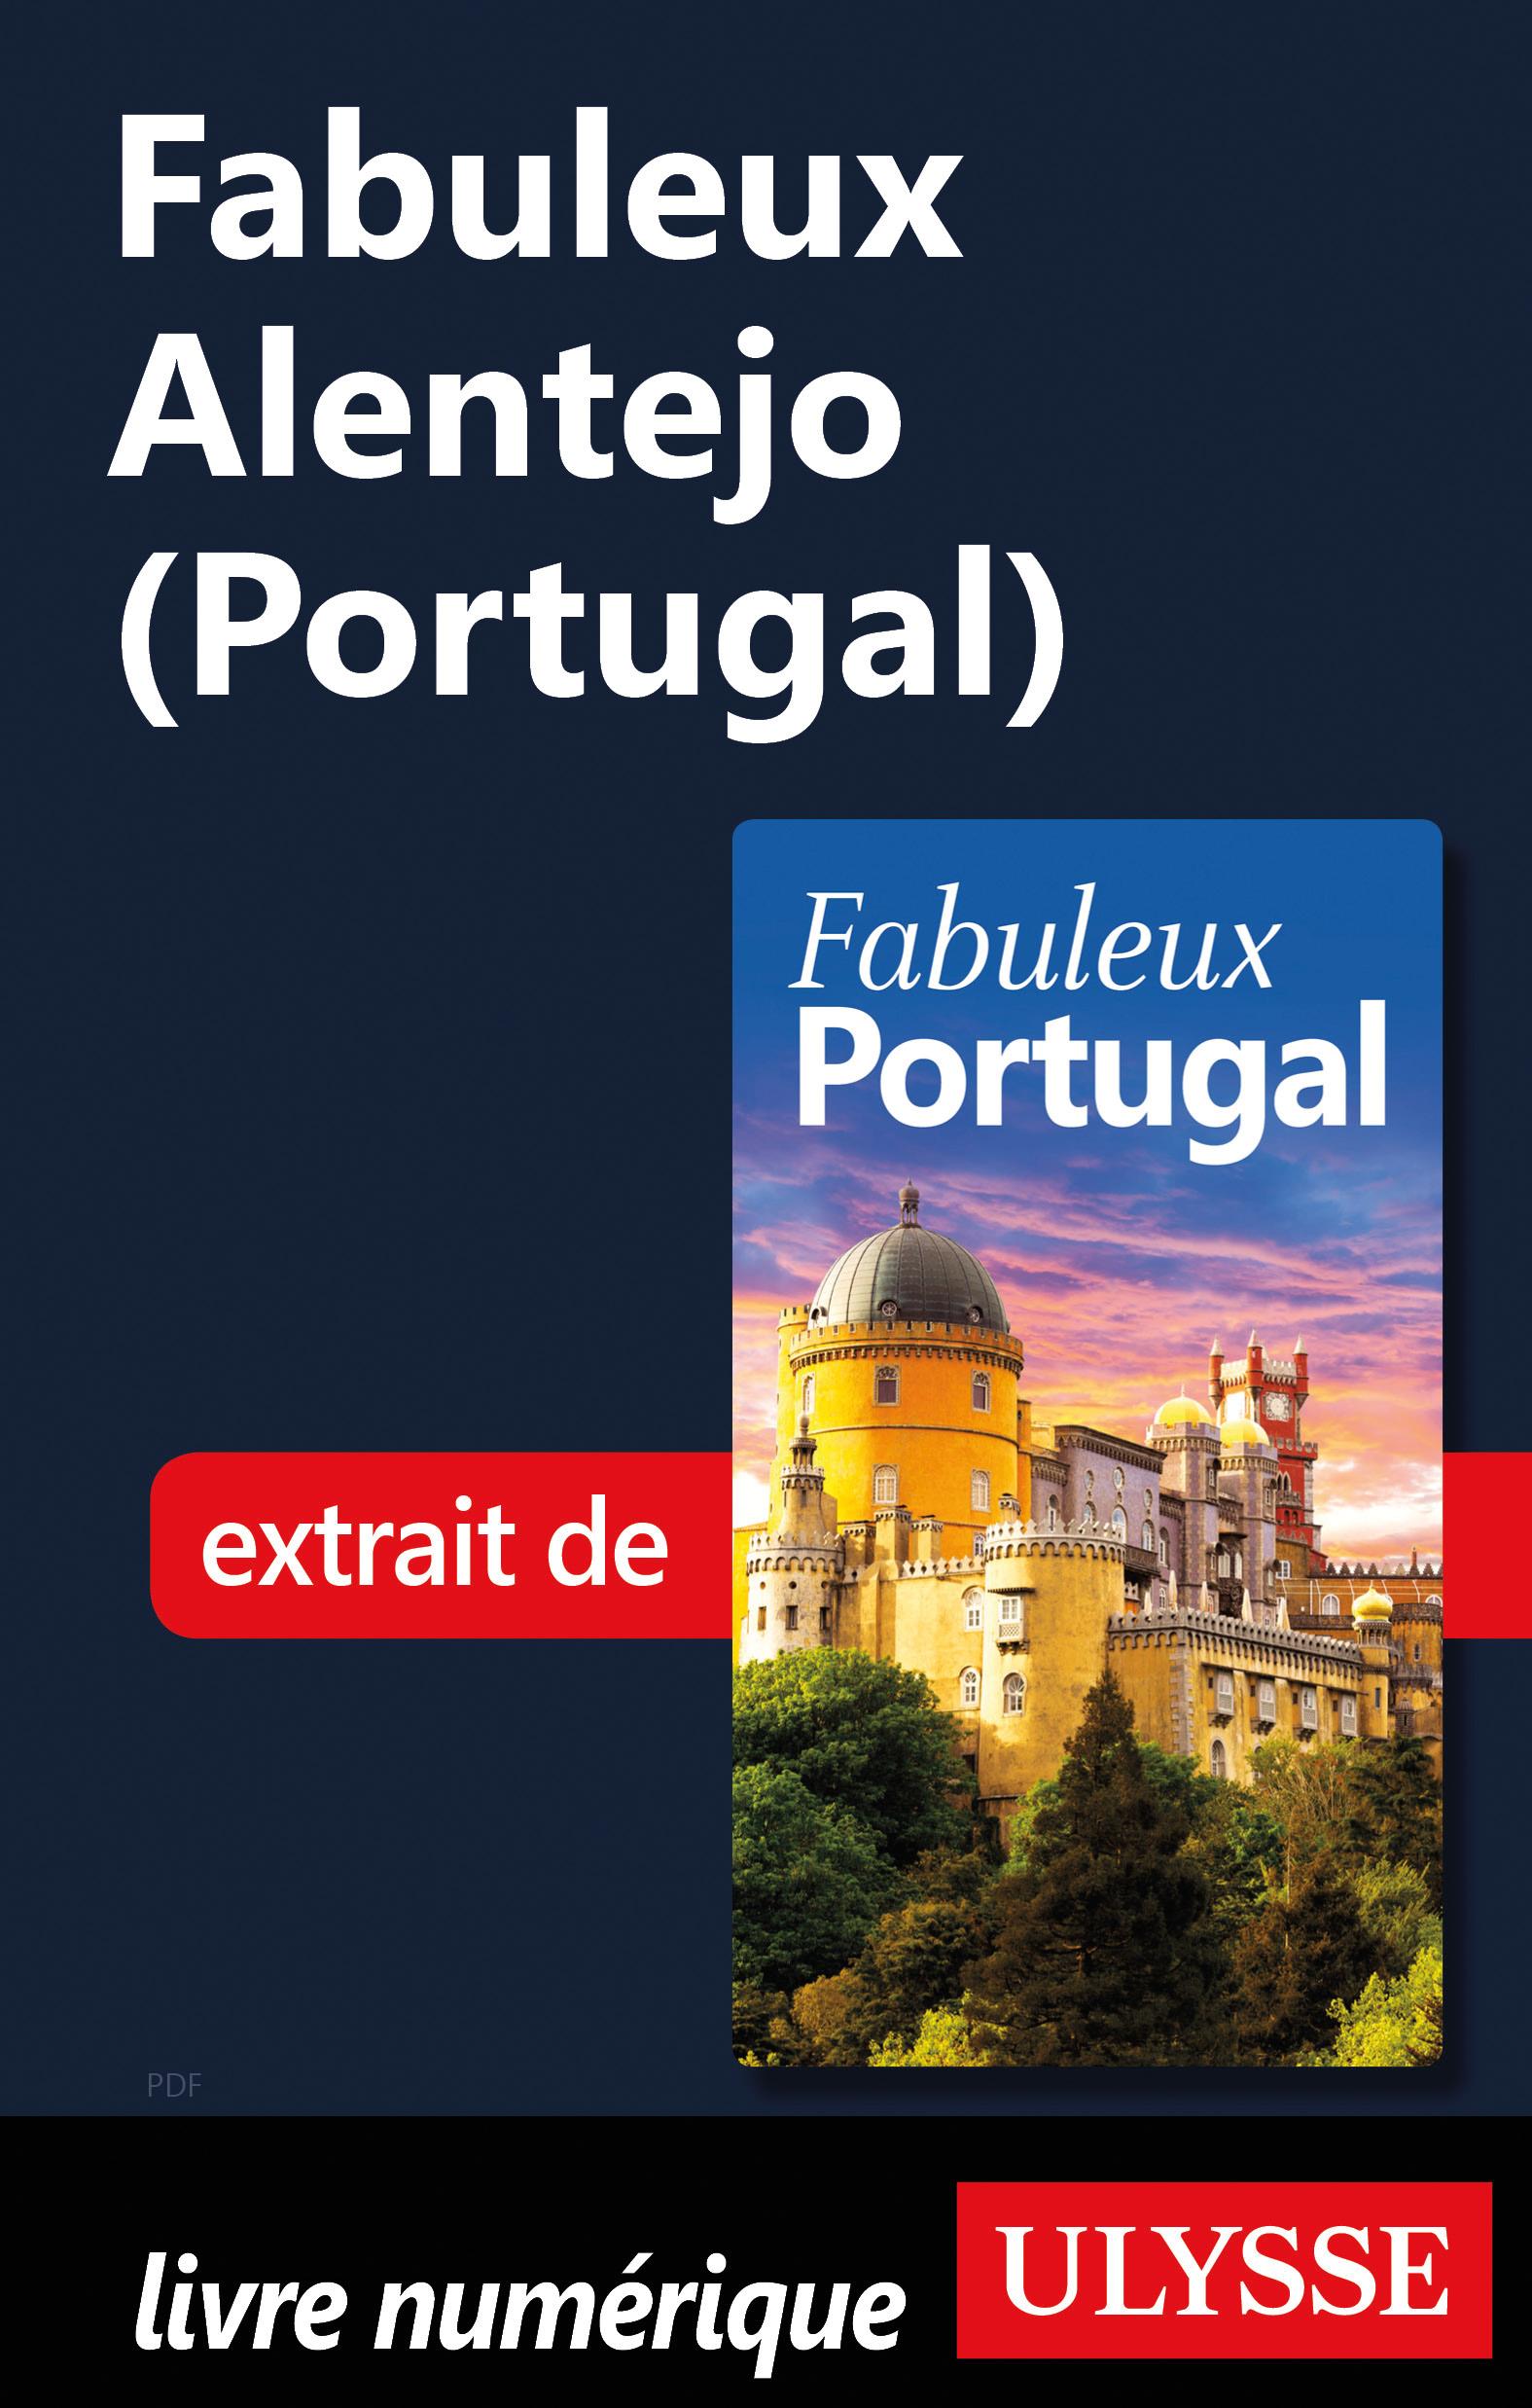 Fabuleux Alentejo (Portugal)